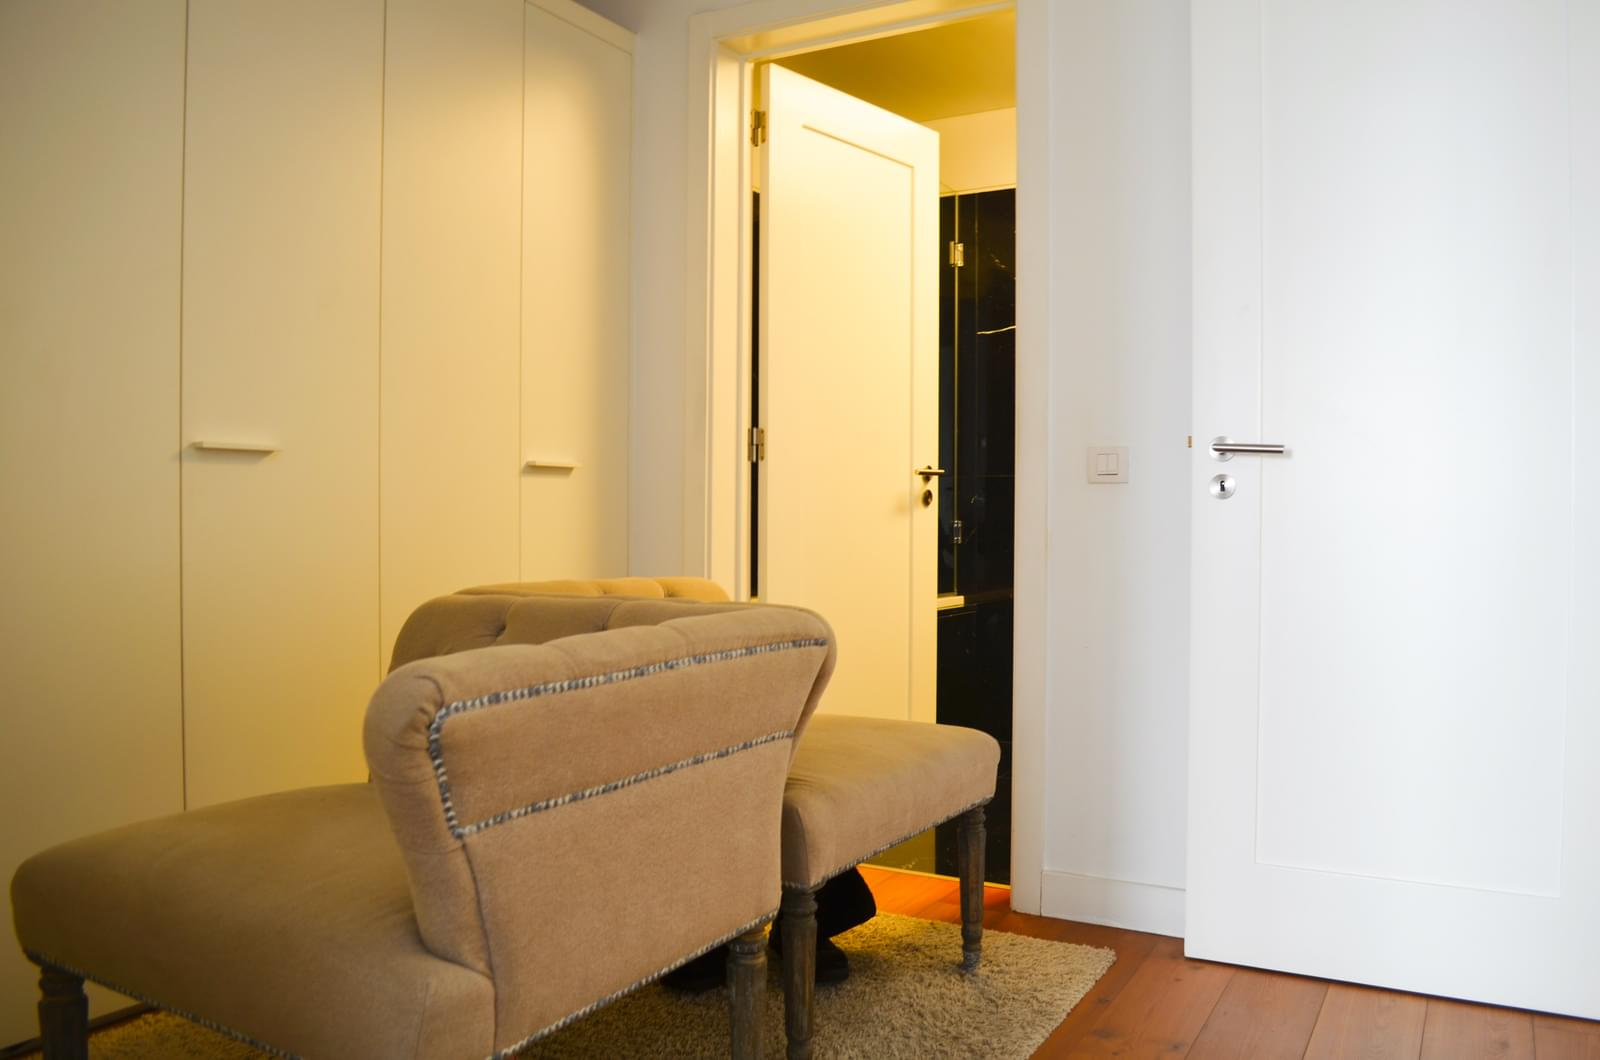 pf18712-apartamento-t2-lisboa-82d7338e-4b10-4fac-a10e-de91d20be8ff